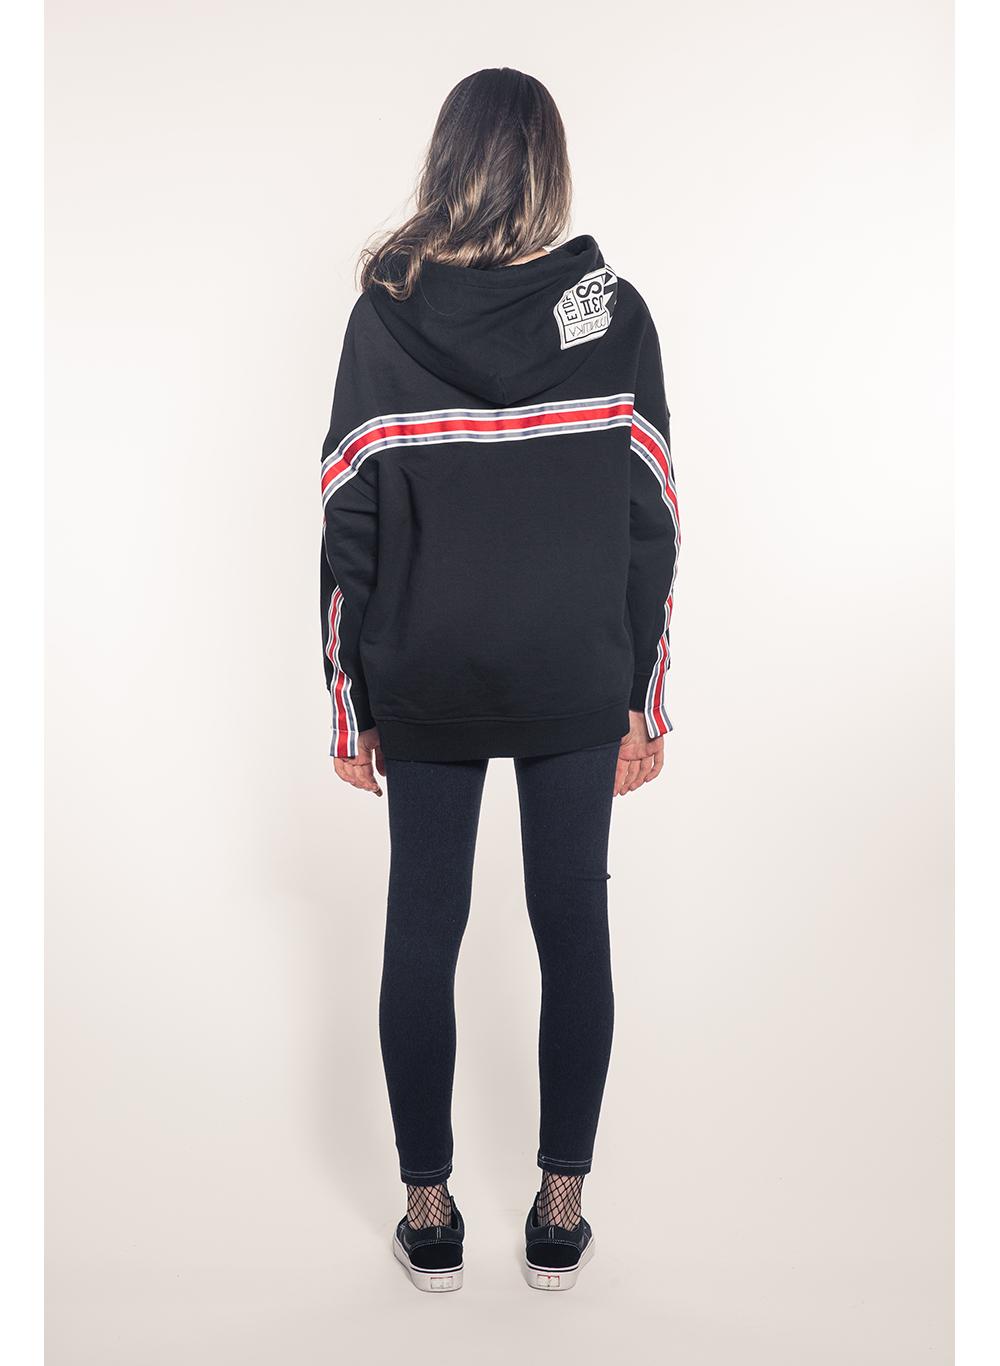 Keep Watch Crest Women's Pullover Hoody